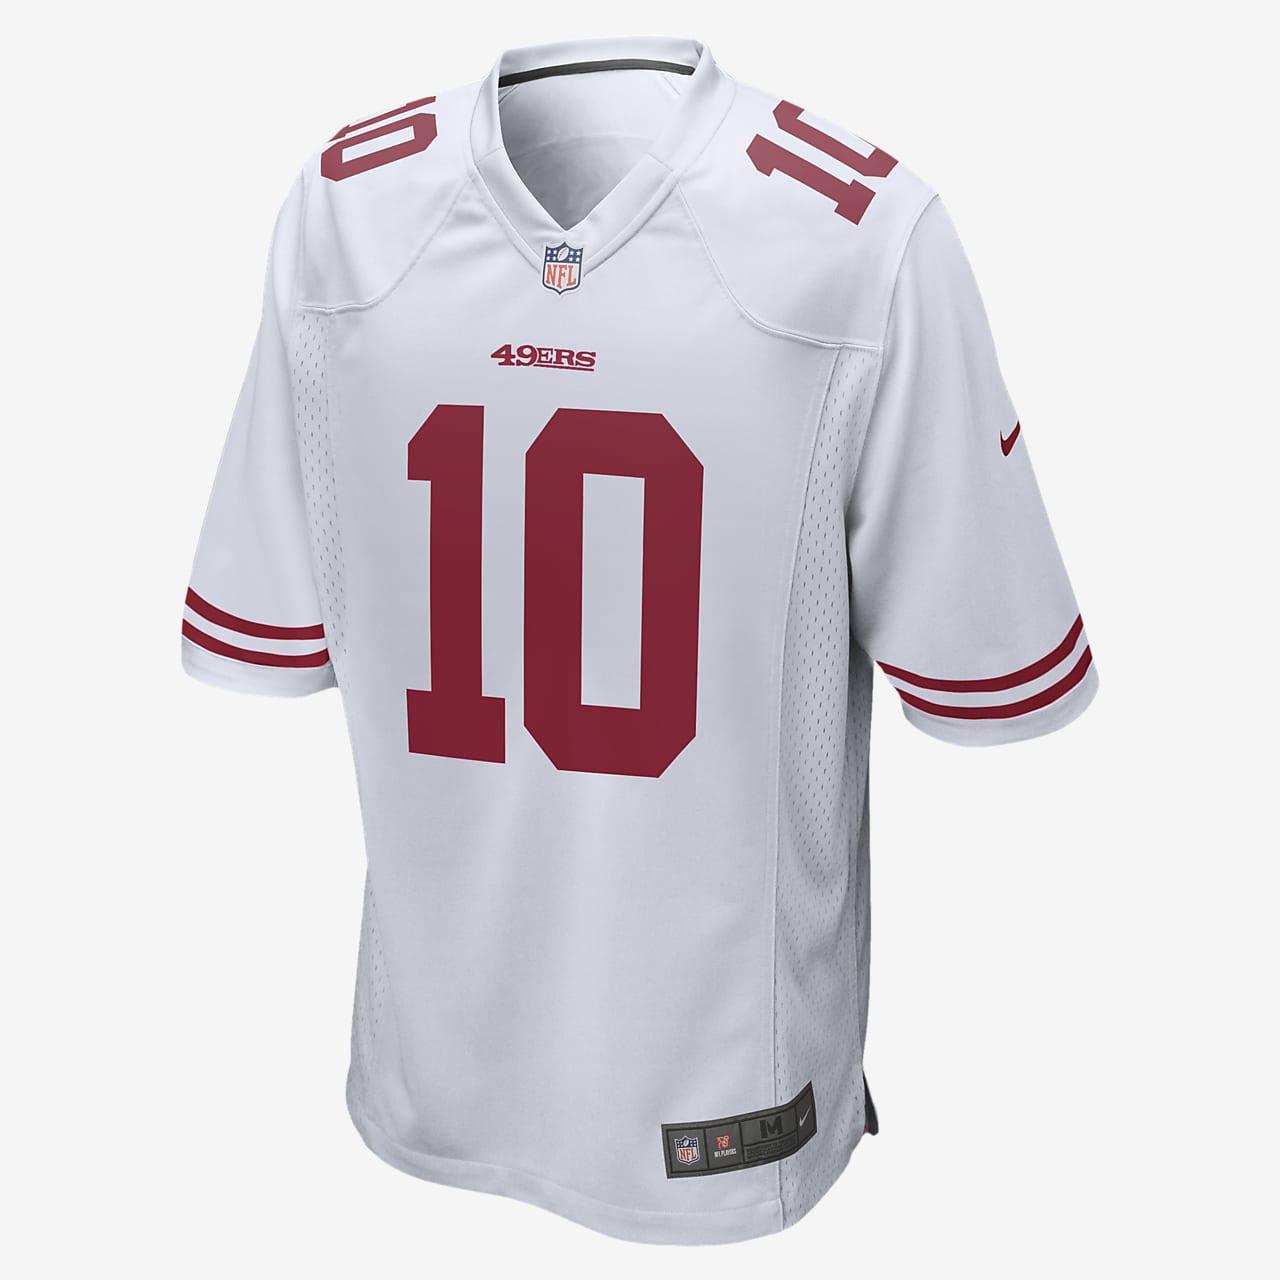 NFL San Francisco 49ers Game (Jimmy Garoppolo) Men's Football Jersey